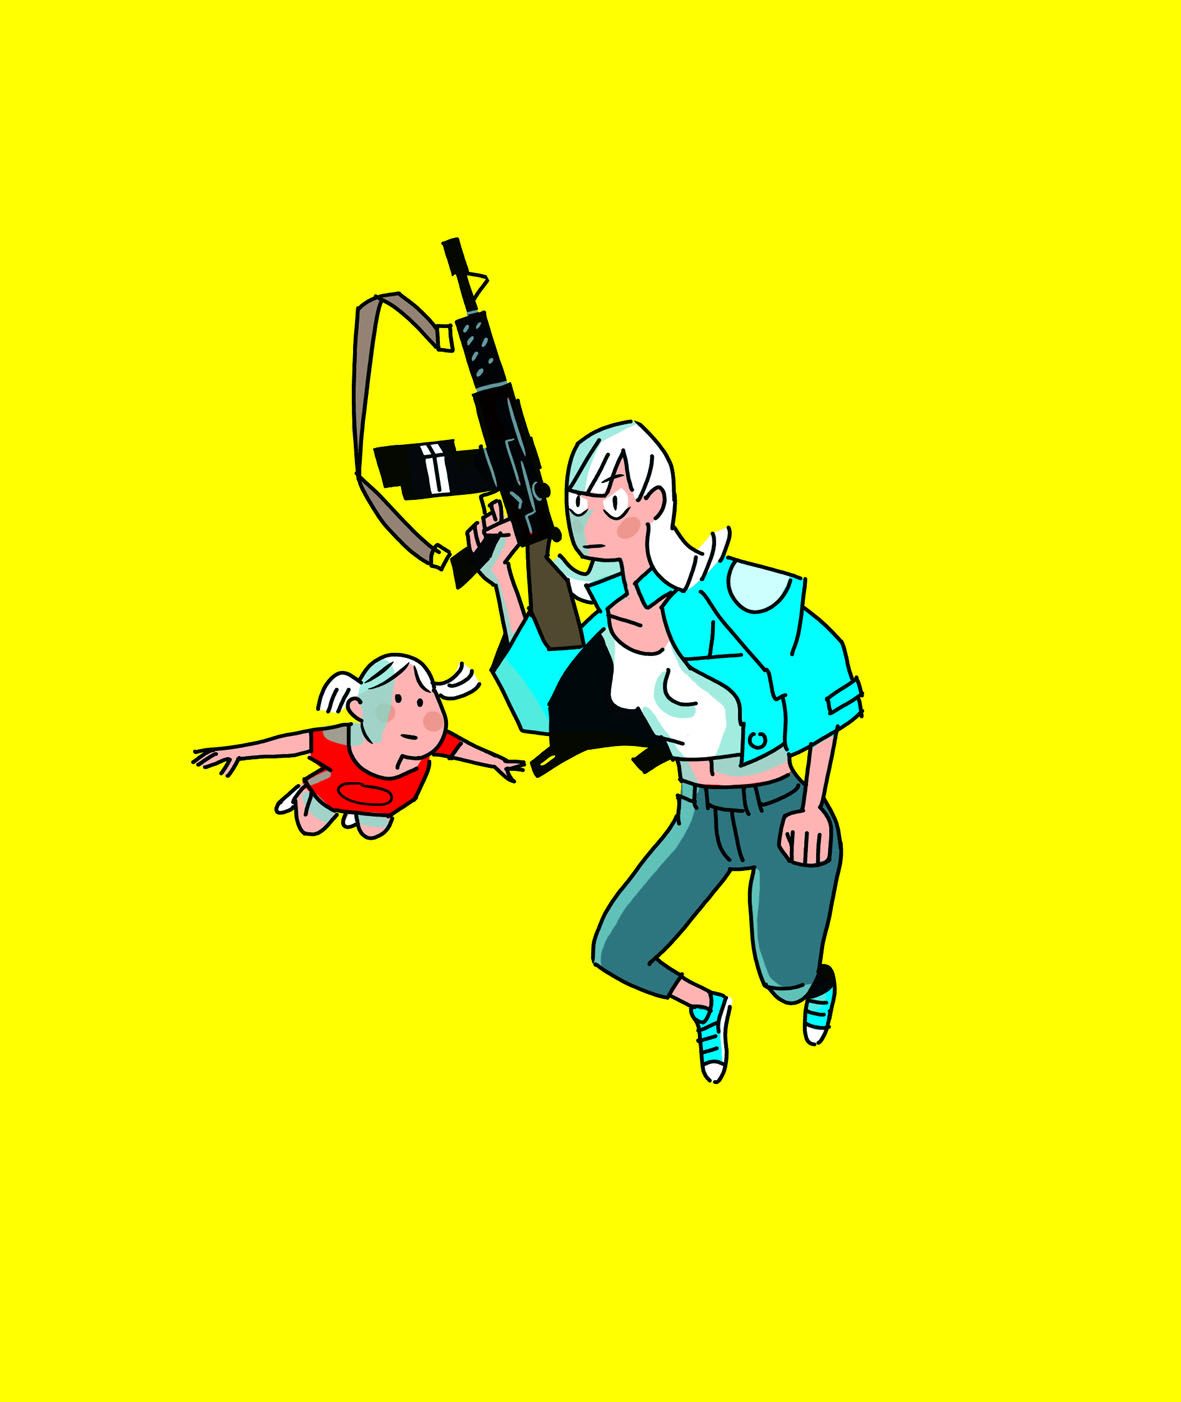 Pingl par skane sur bande dessin bande dessin e dessin et graphique - Bande dessinee simpson ...